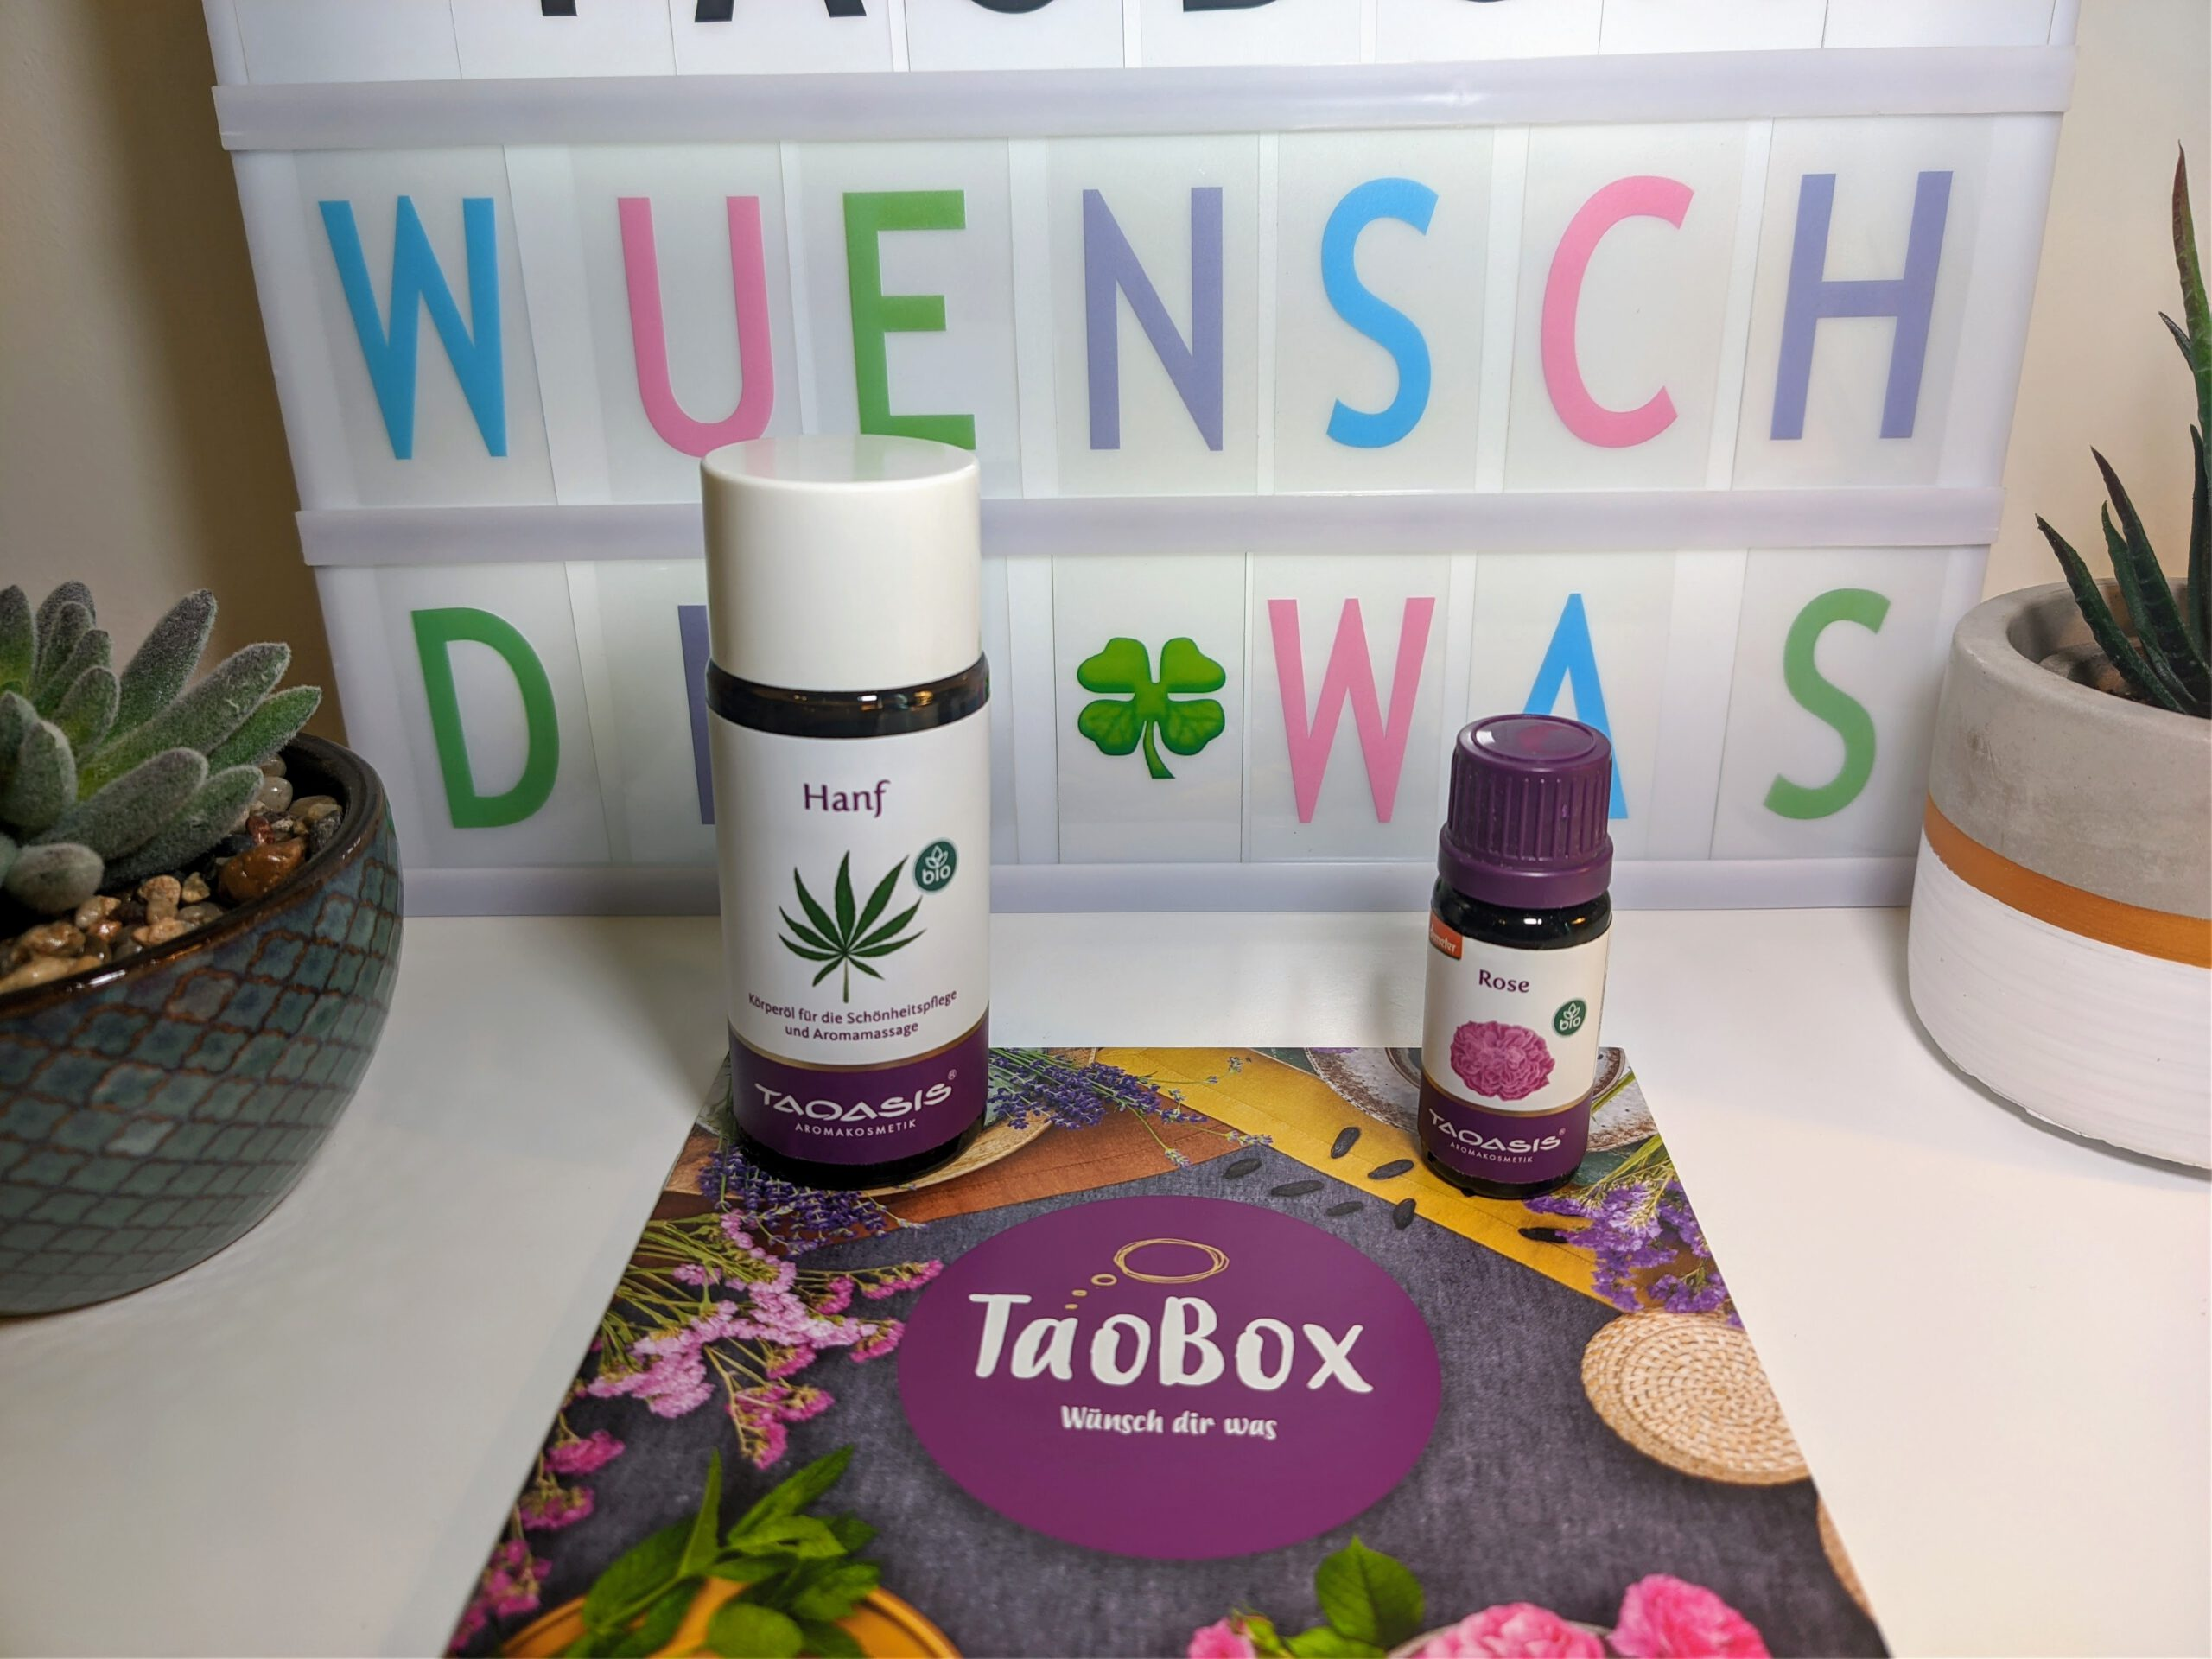 TaoBox – Wünsch dir was – Hanf Körperöl und Rosenöl